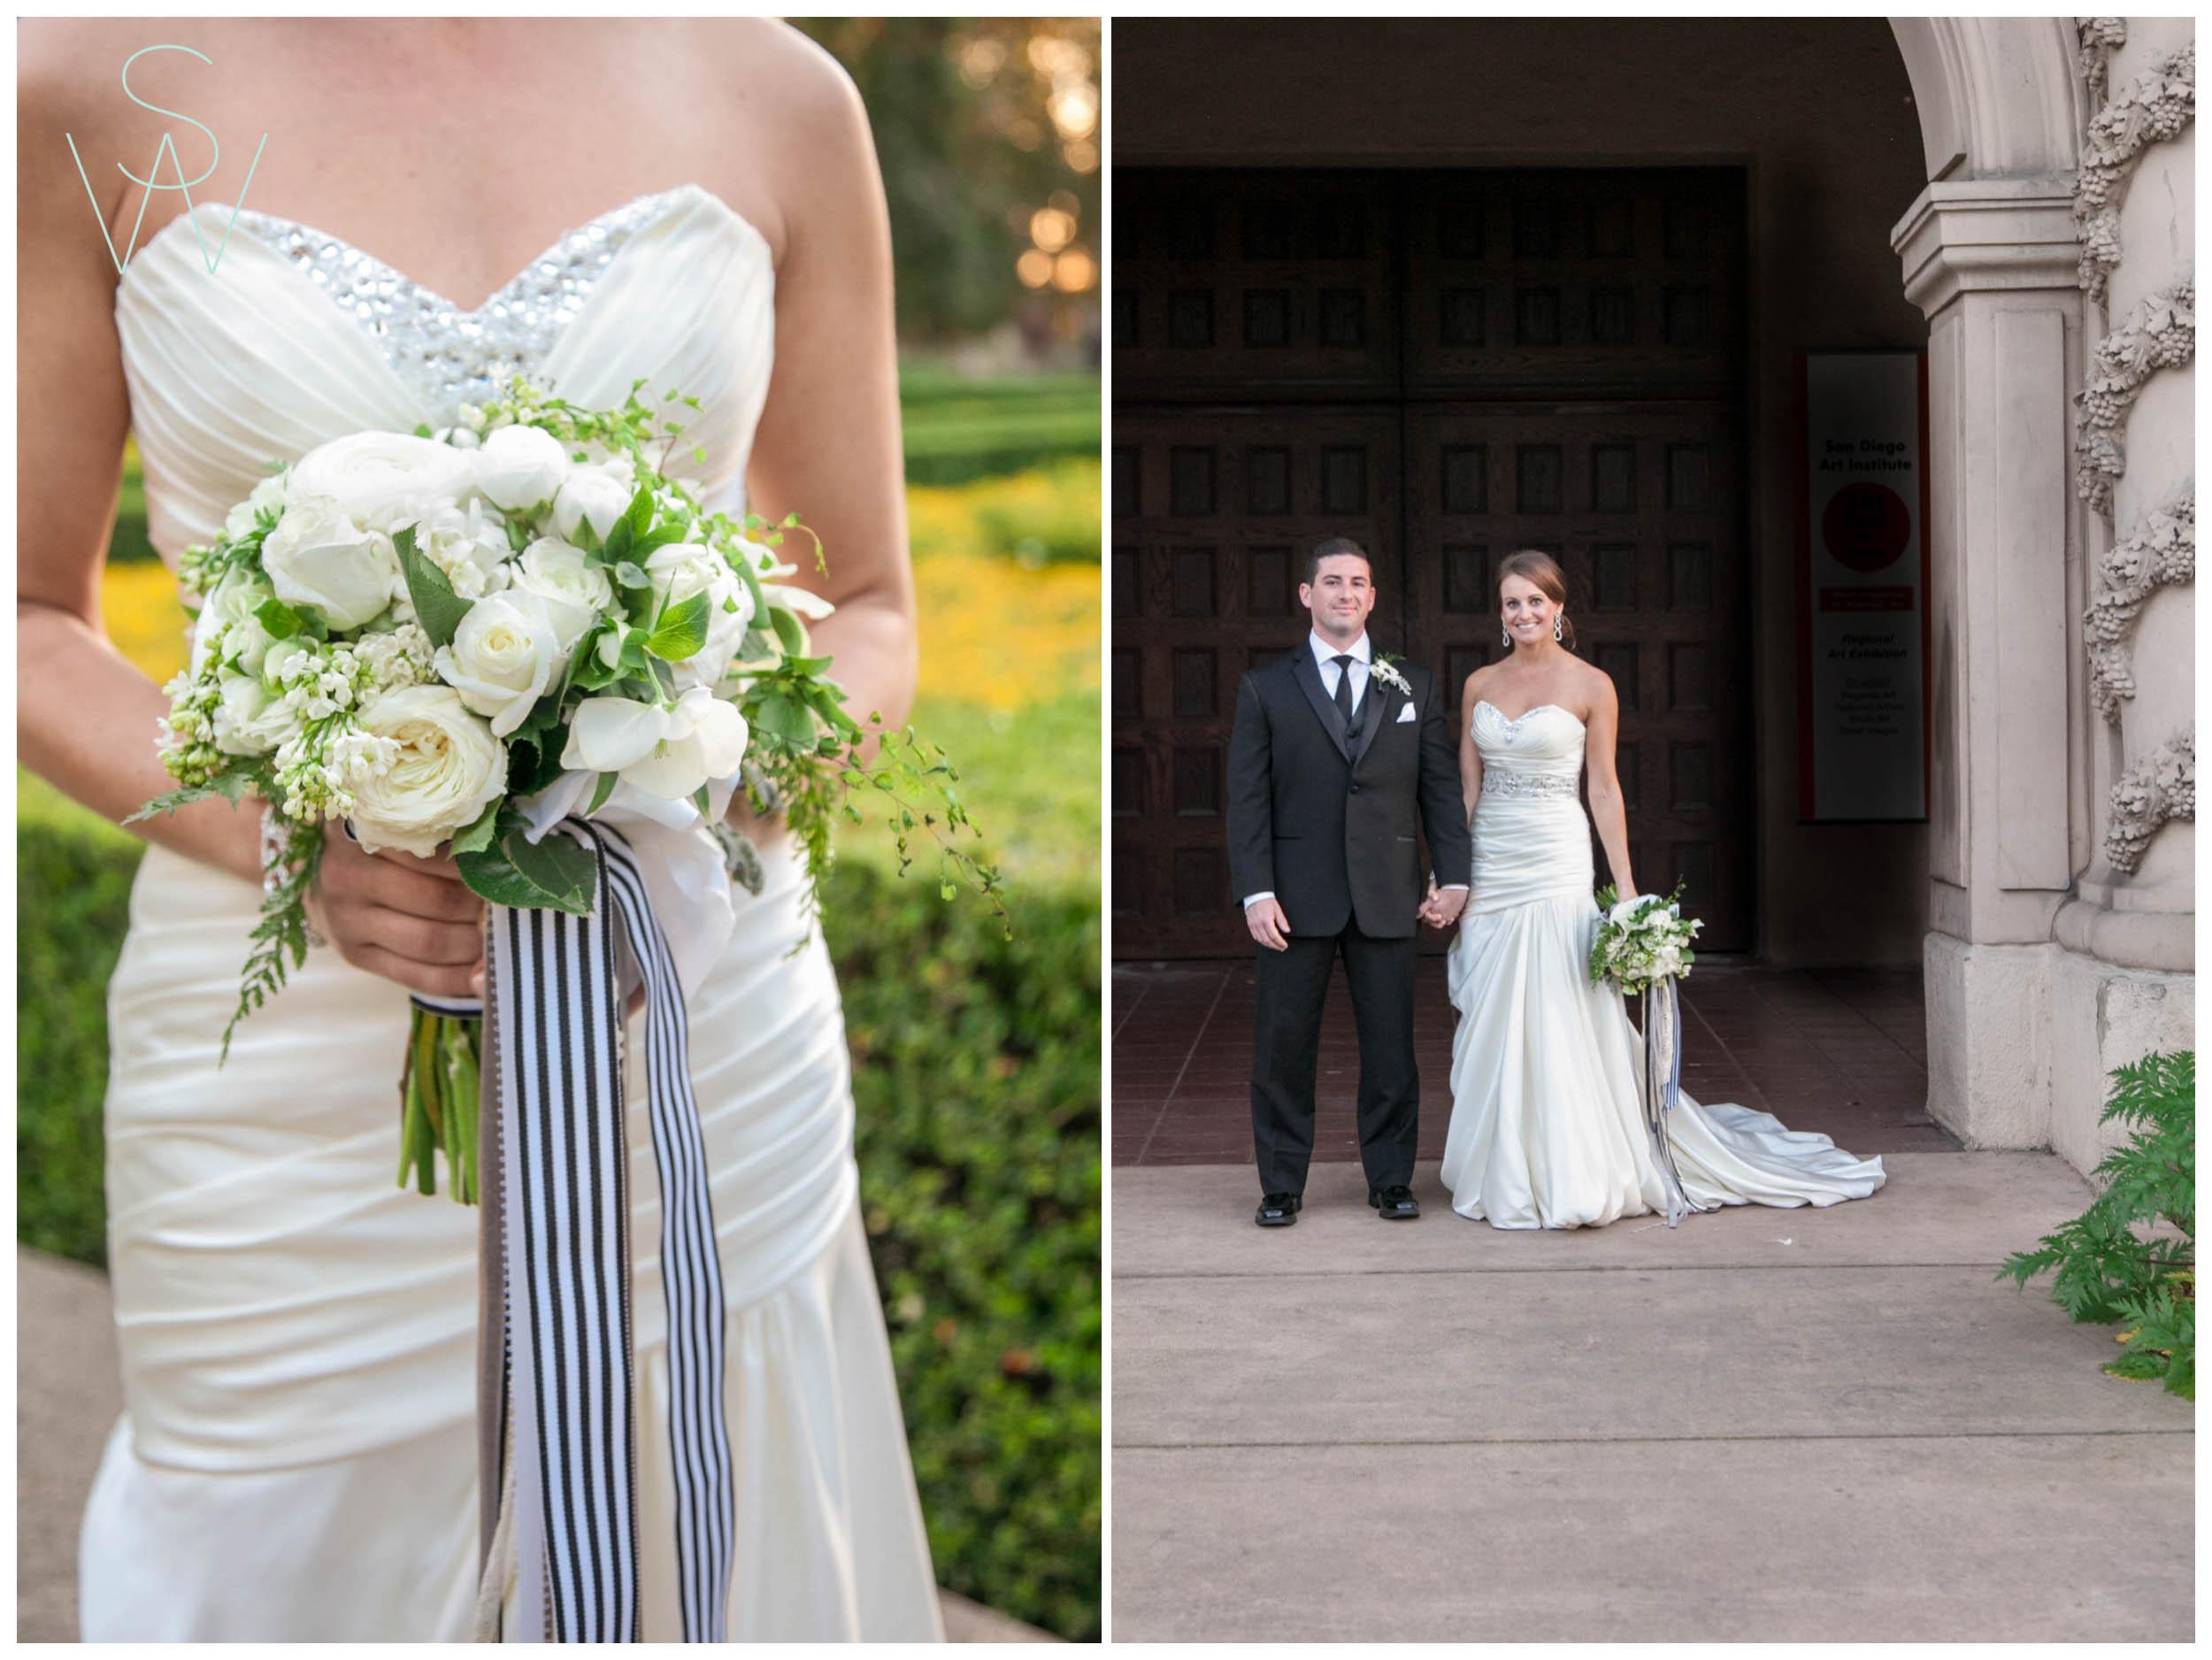 Shewanders.sdma_.wedding.photography-1060.jpg.wedding.photography-1060.jpg